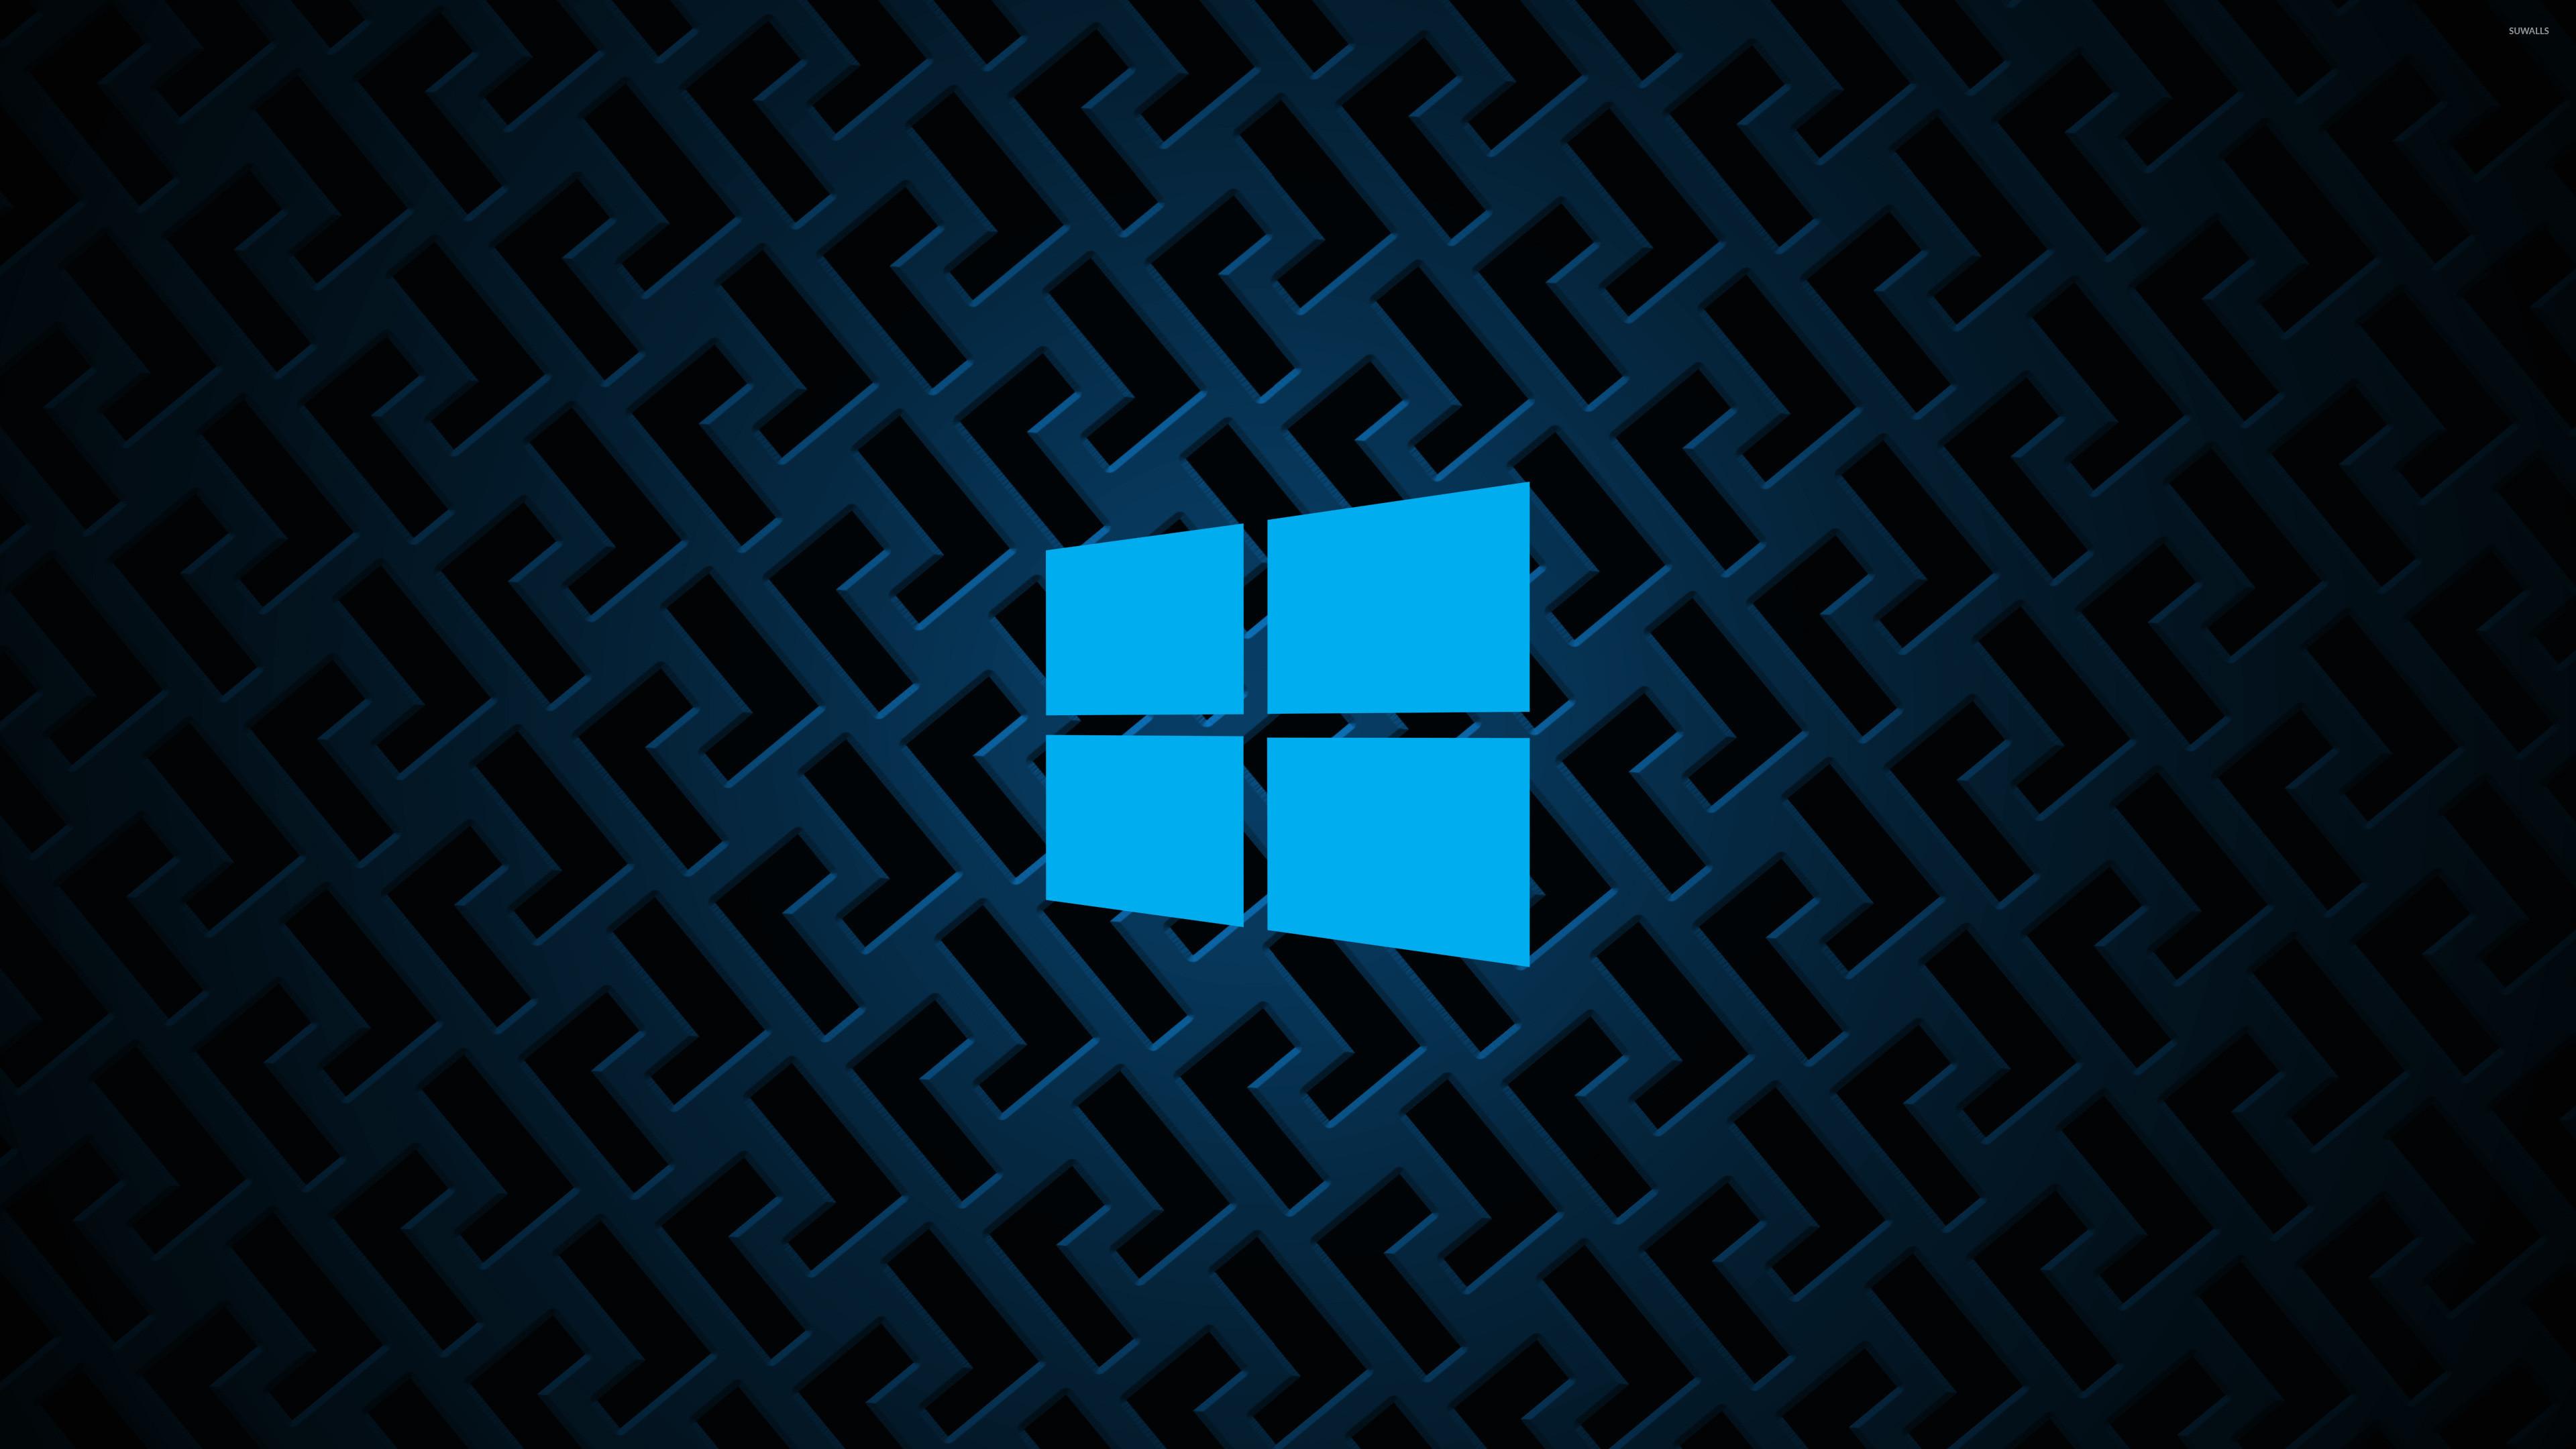 Windows 10 on metallic grid simple blue logo wallpaper